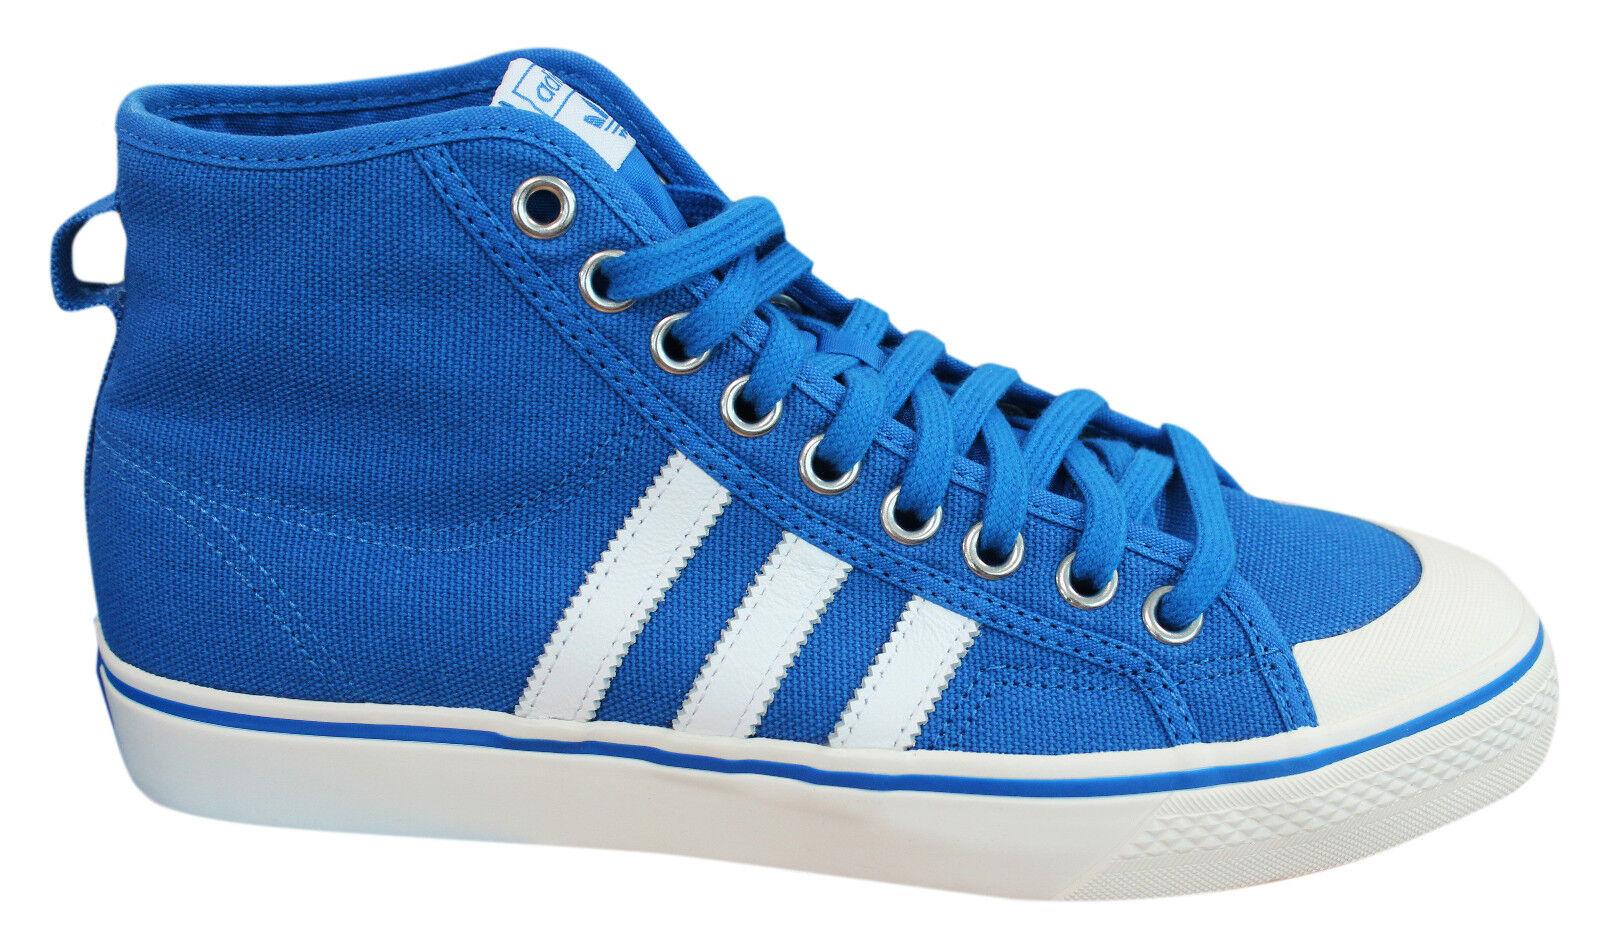 Adidas Originals Nizza Hi Mens Trainers Lace Up schuhe Blau Weiß BZ0548 M17